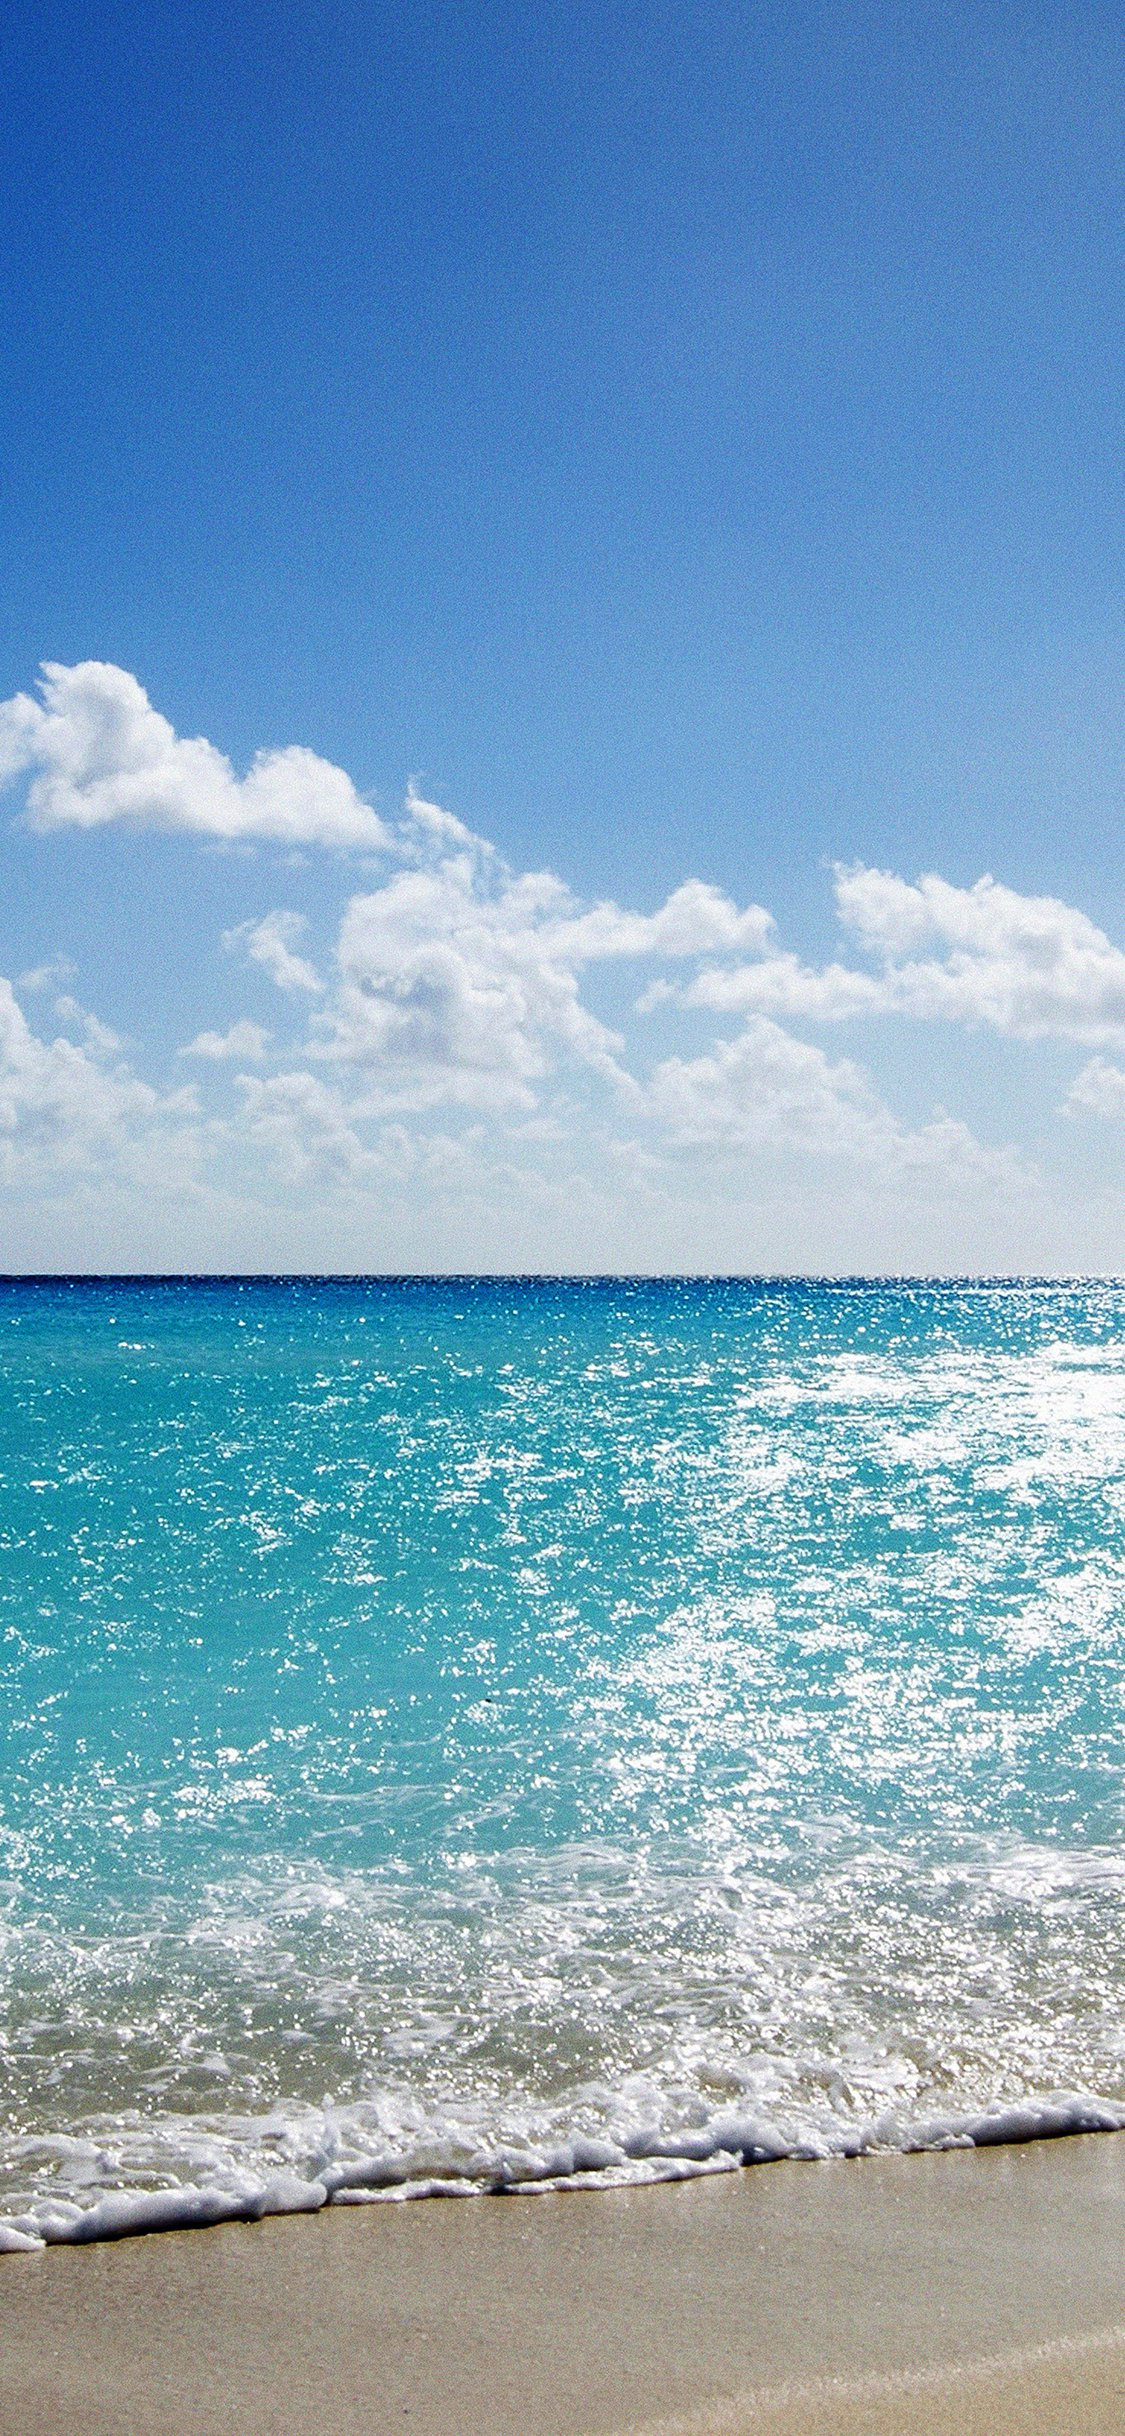 Sea Water Ocean Sky Sunny Iphone X Wallpapers Free Download